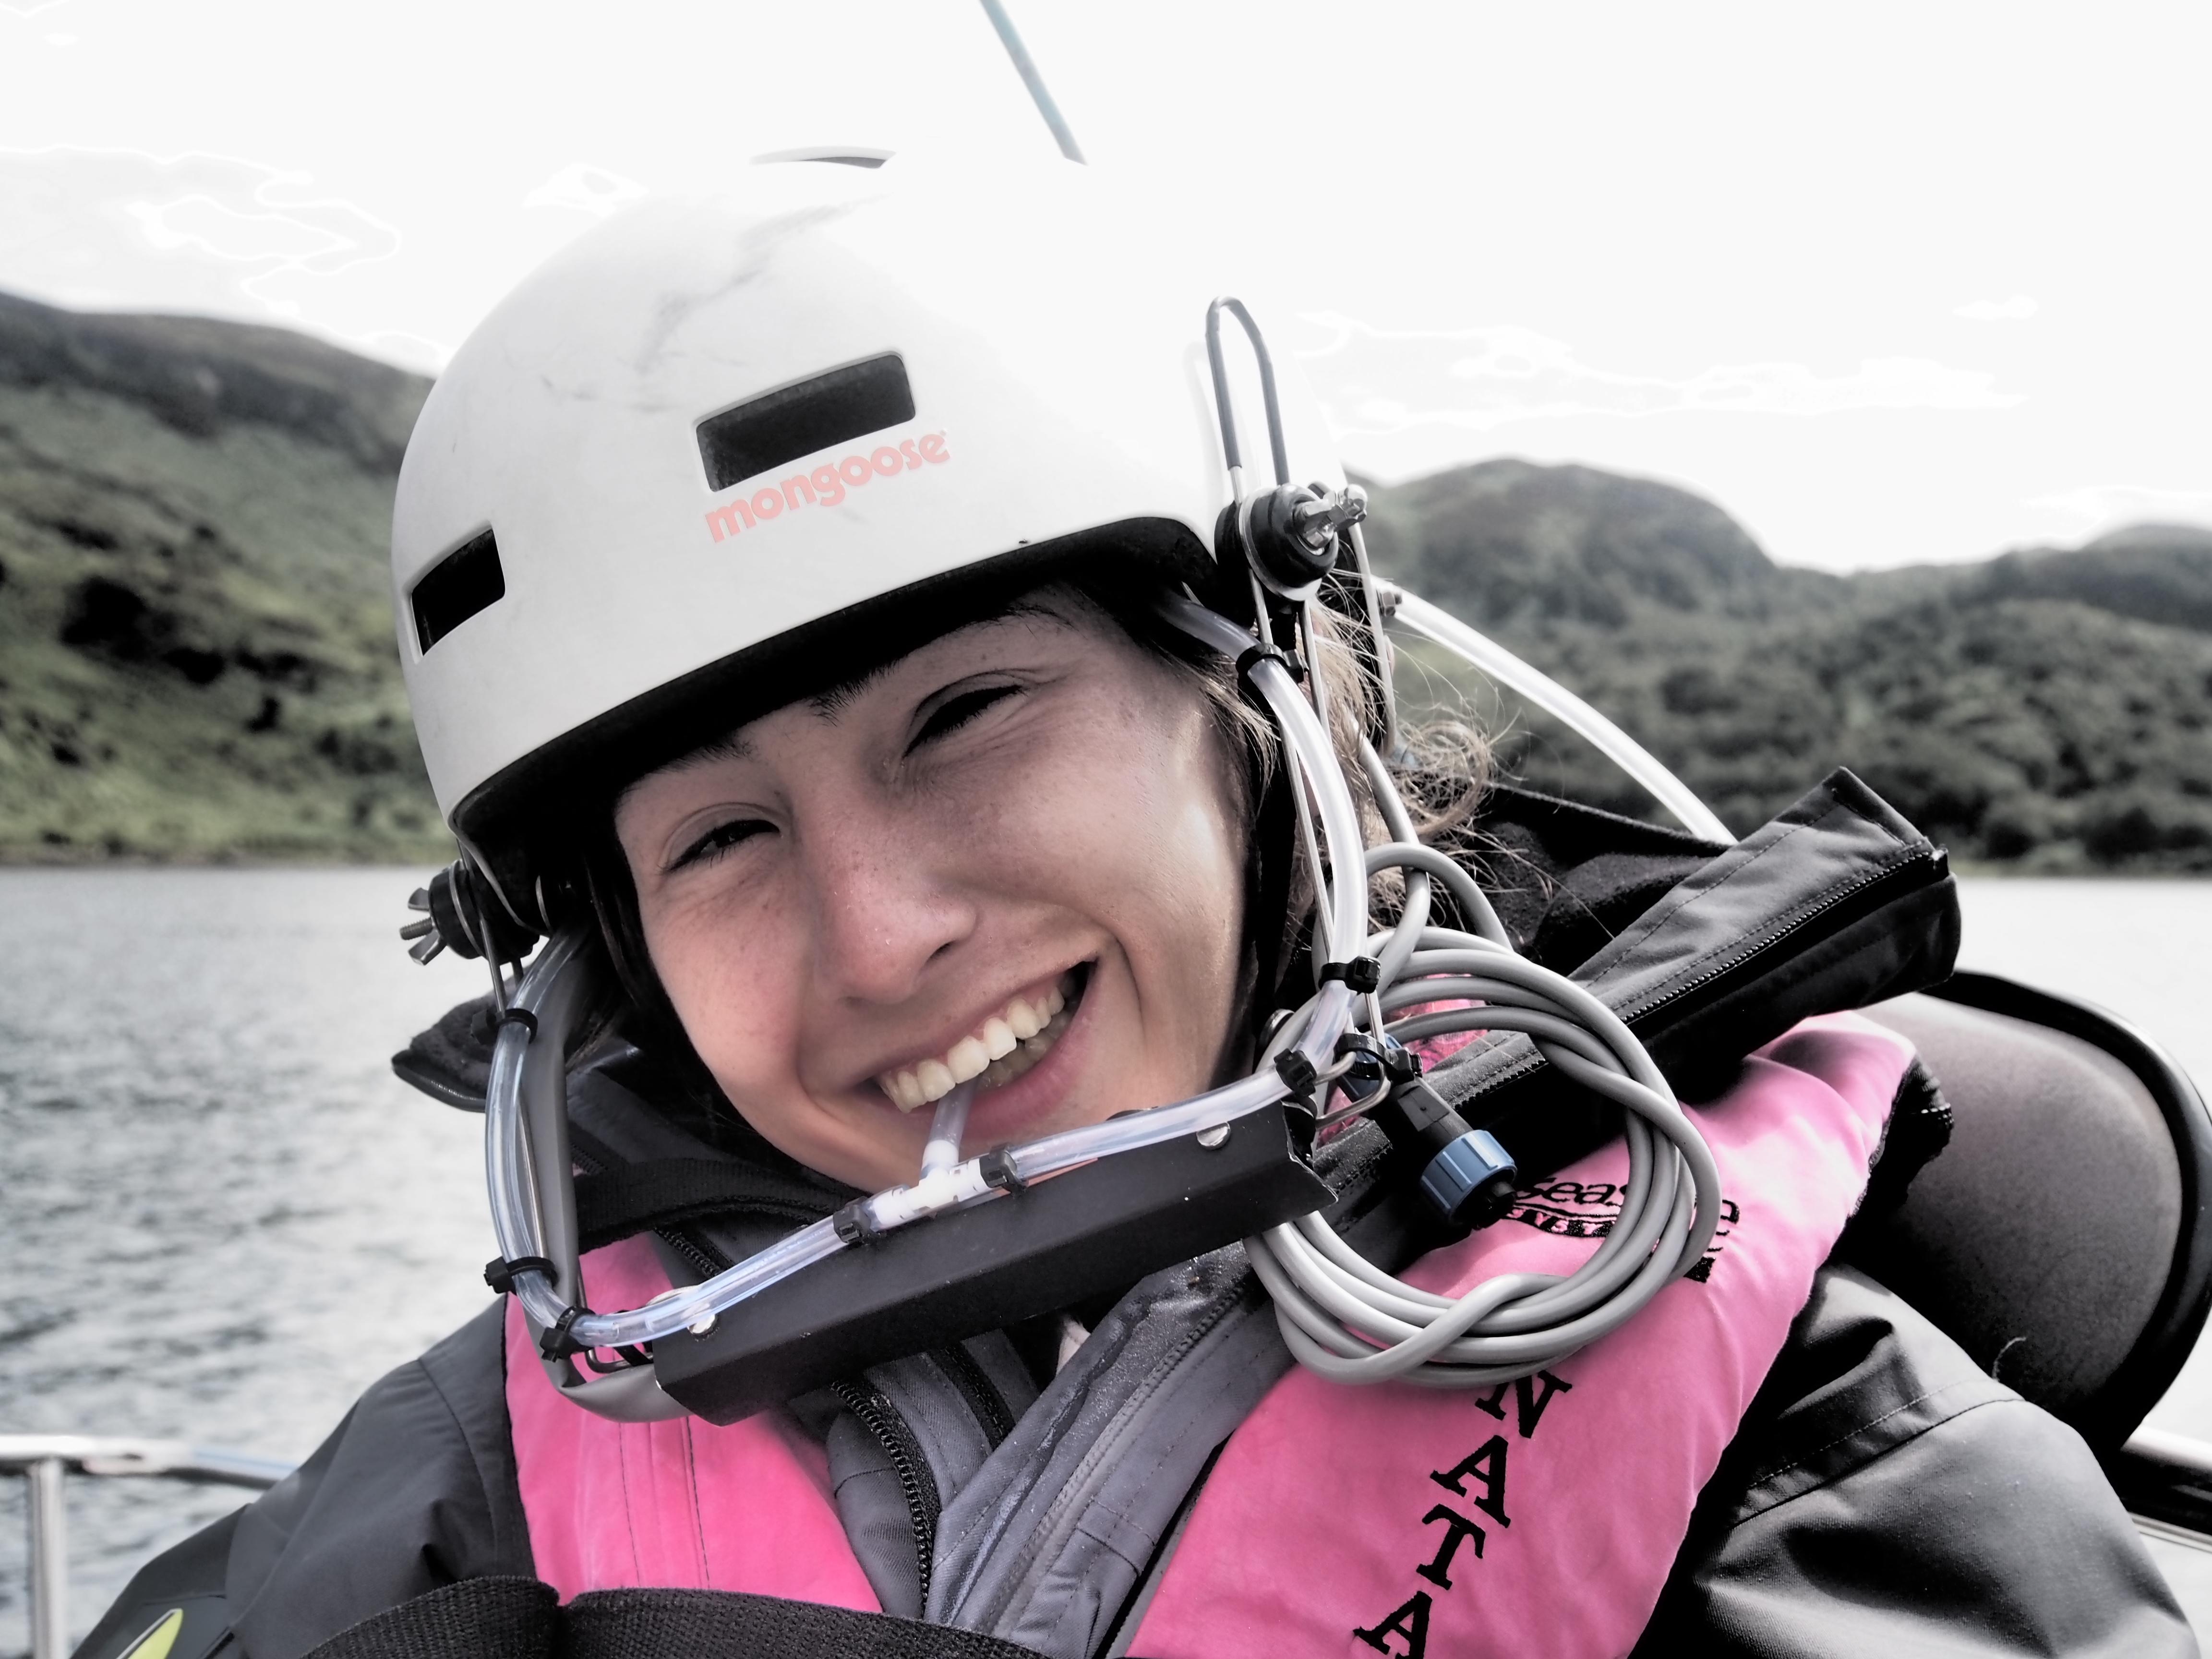 In a white helmet and pink lifejacket Natasha Lambert